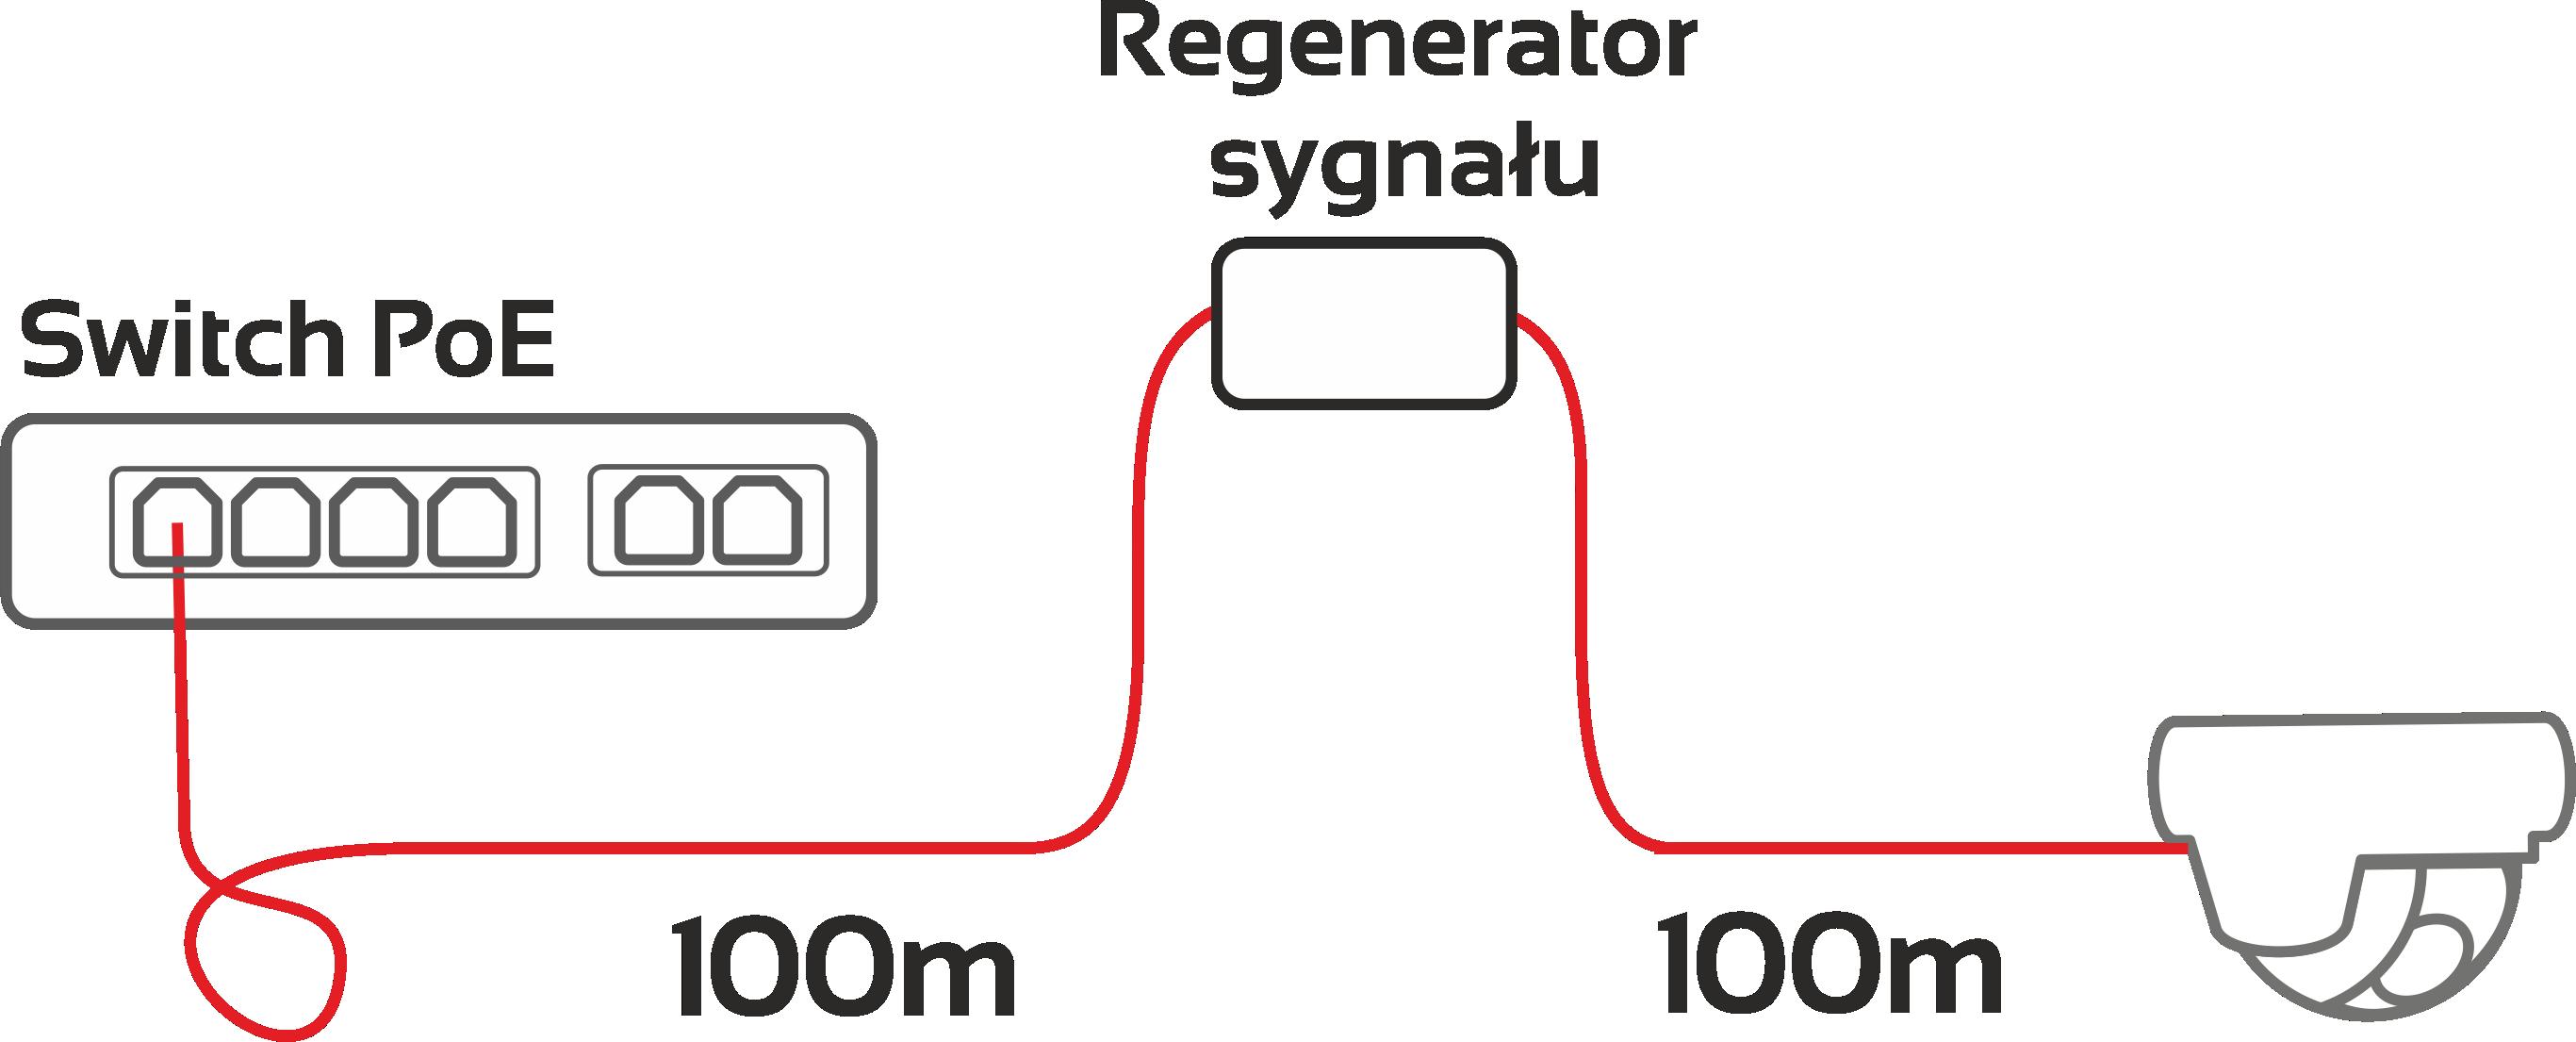 regenerator sygnału